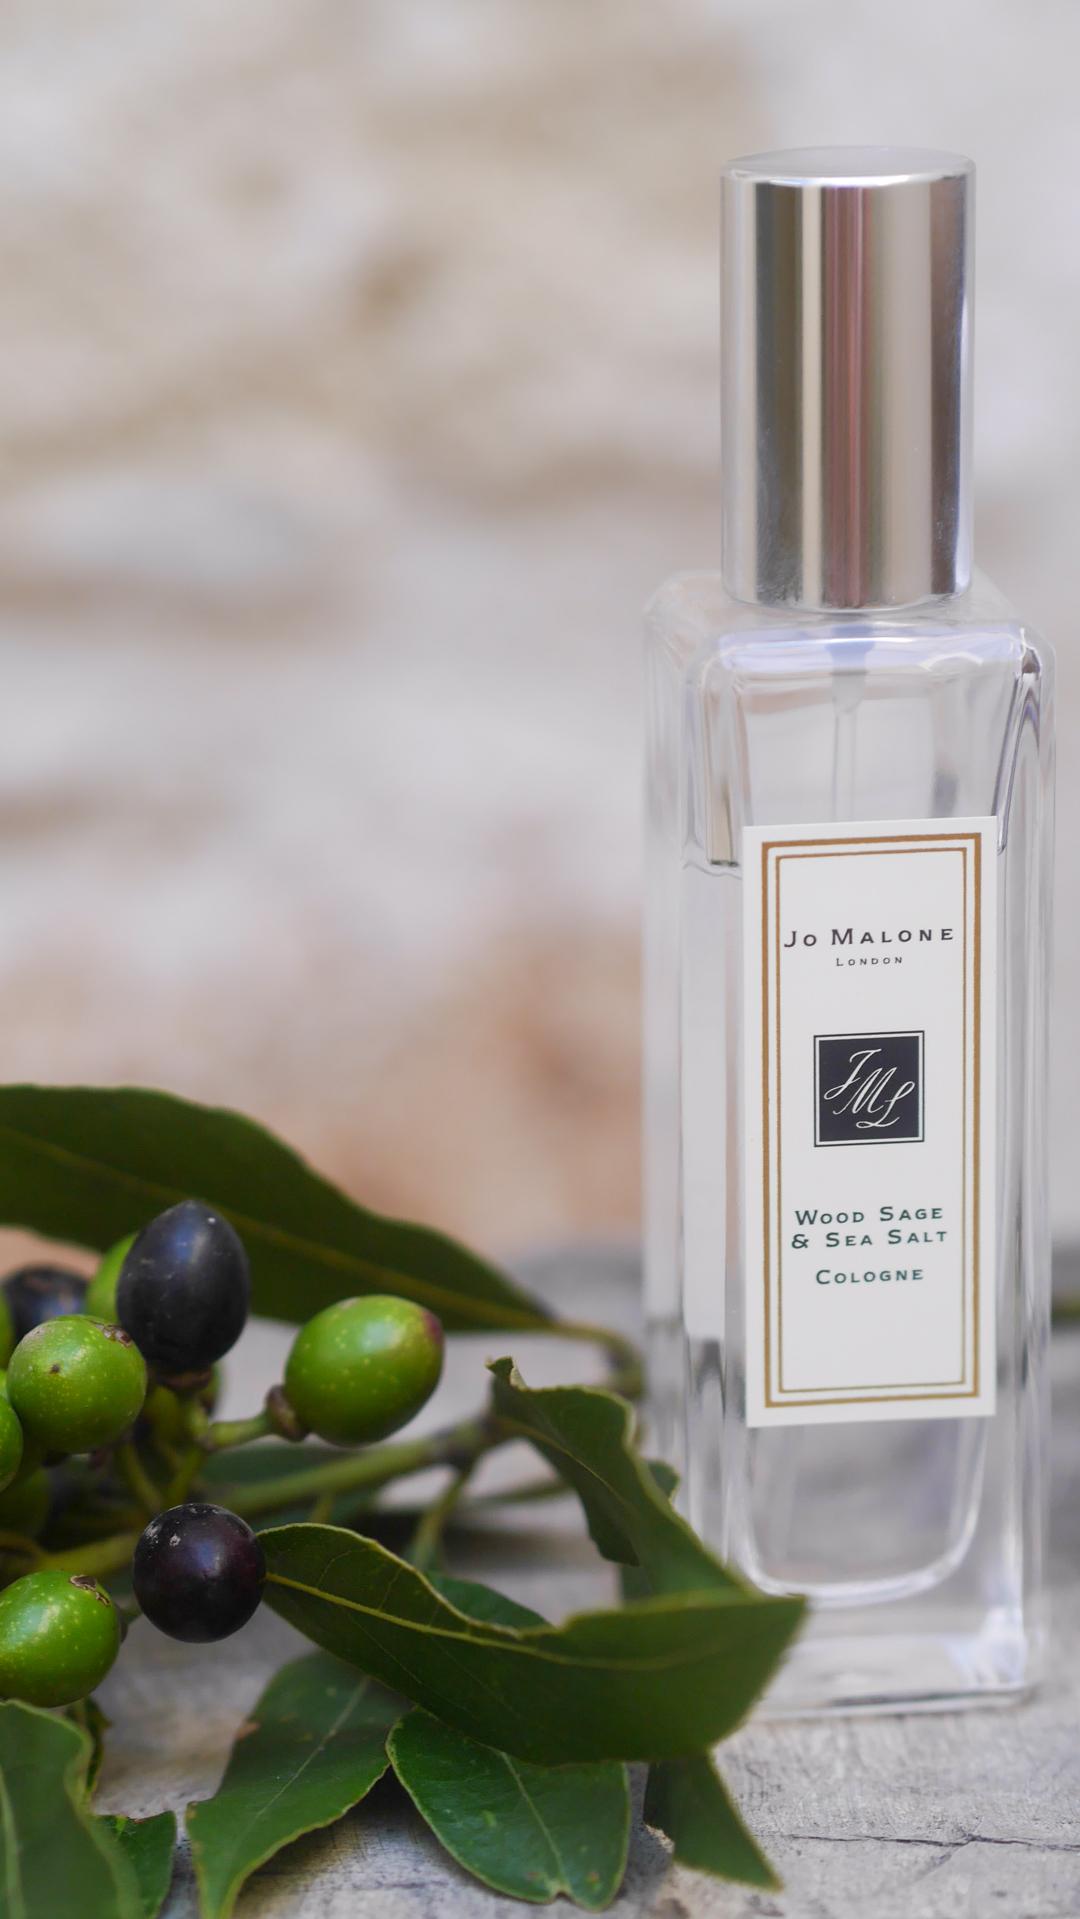 Five new beauty favourites - Jo Malone Sea Salt